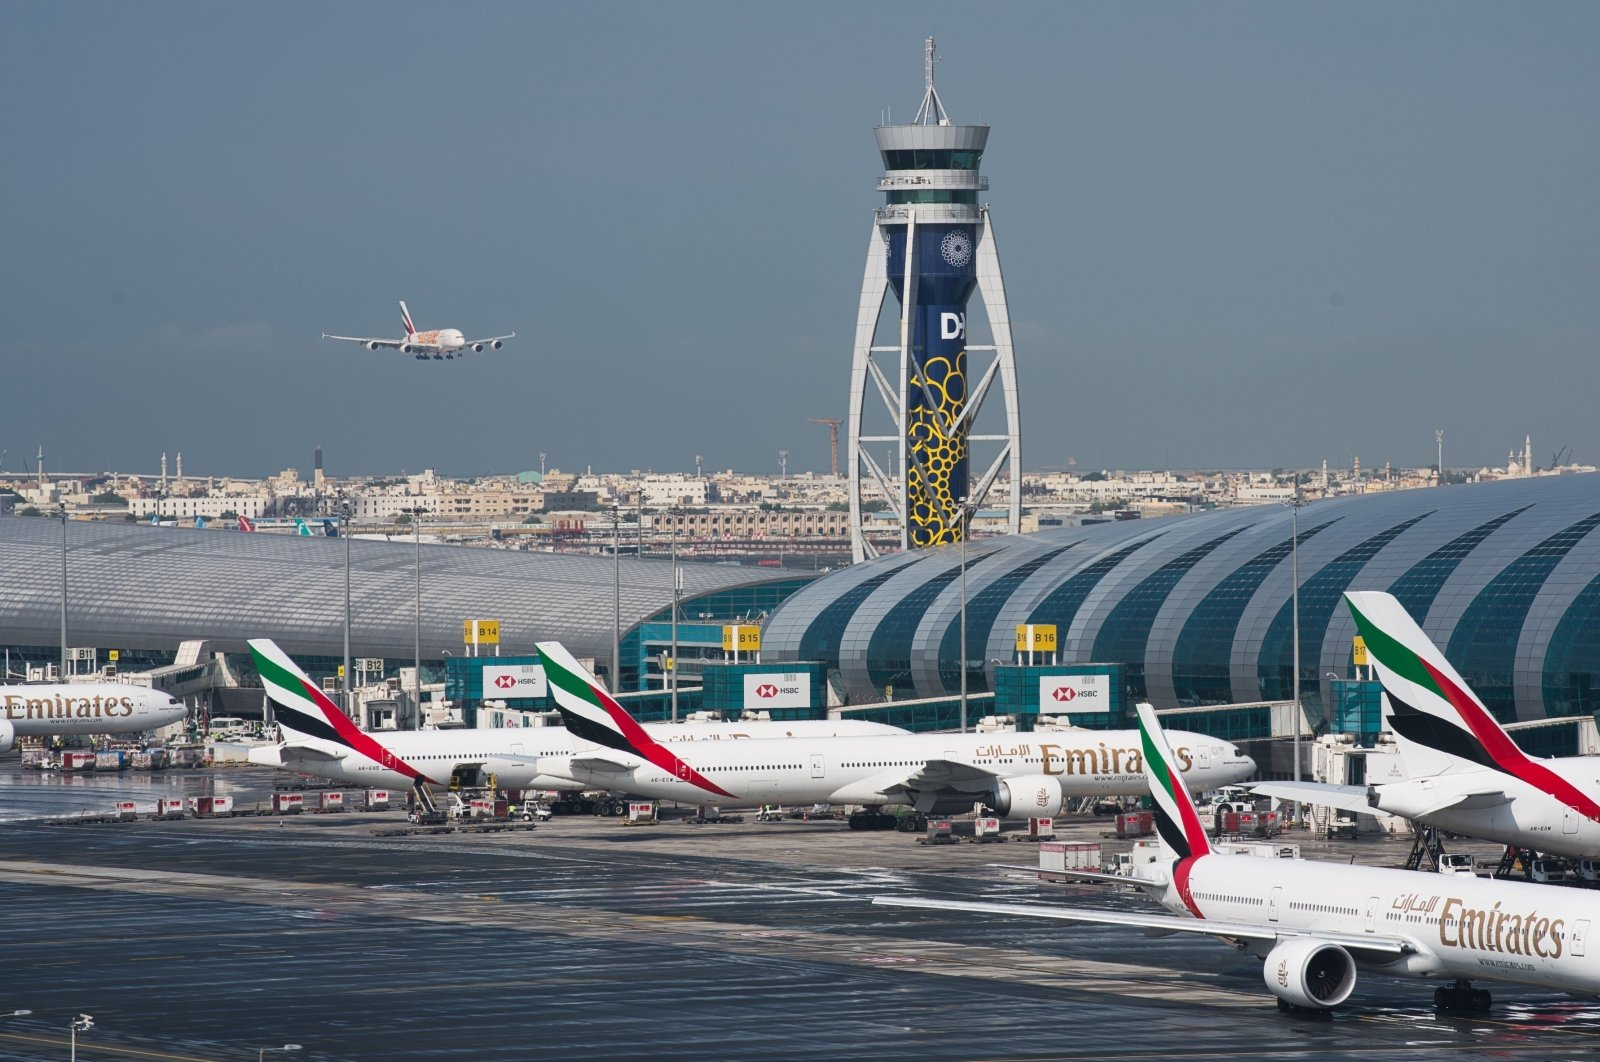 An Emirates jetliner comes in for landing at Dubai International Airport in Dubai, United Arab Emirates, Dec. 11, 2019. (AP Photo)